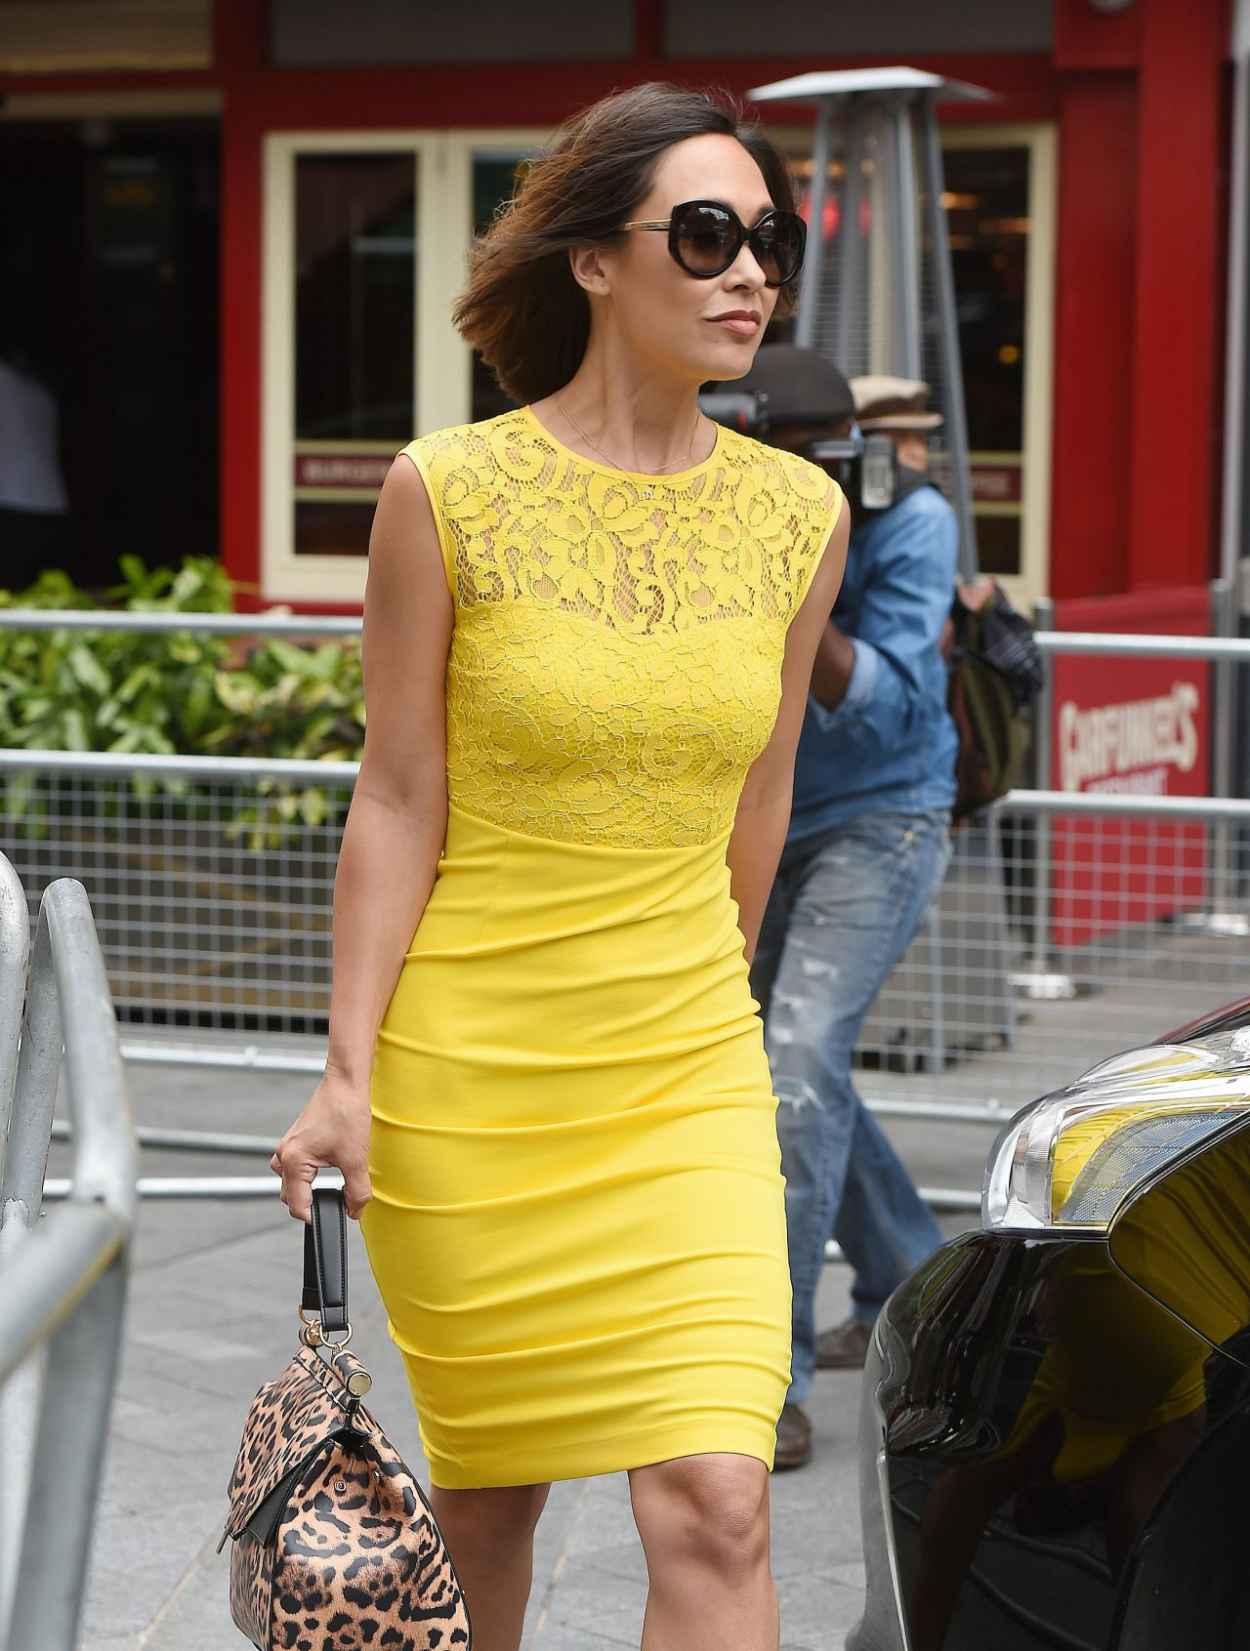 Myleene Klass Style - Arrives at Global Radio in London, July 2015-2